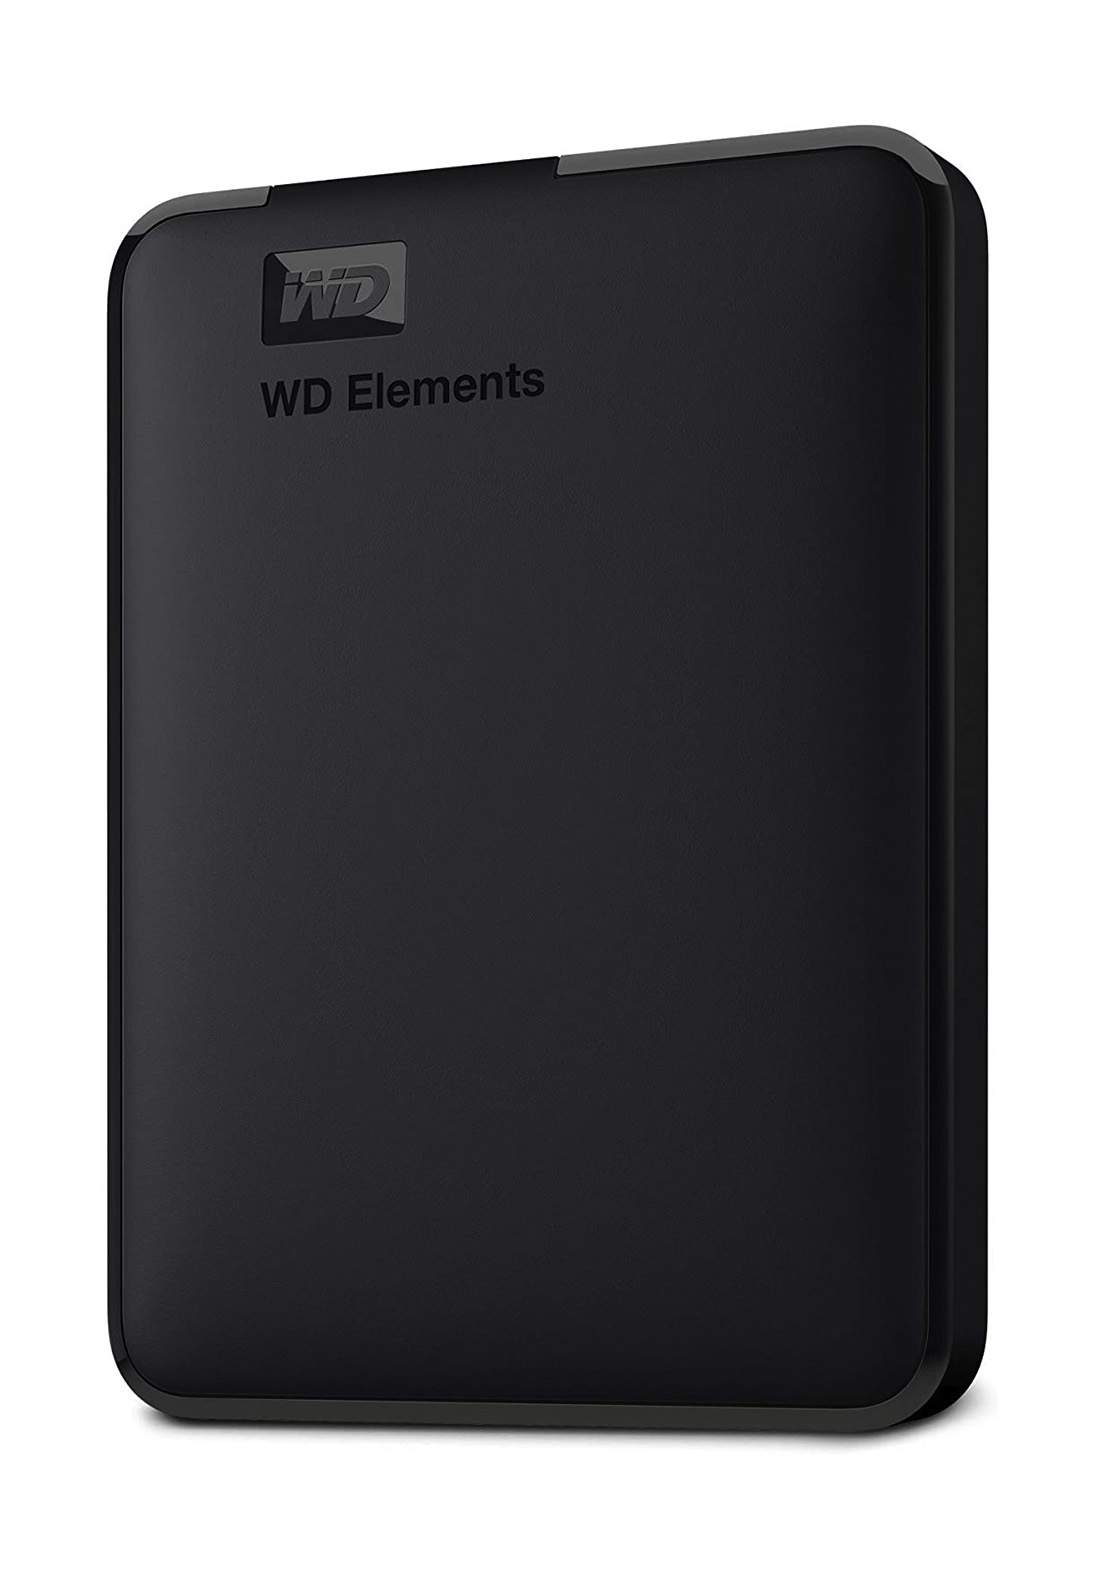 WD 2TB USB 3.0 Elements Portable External Hard Drive - Black هارد خارجي محمول